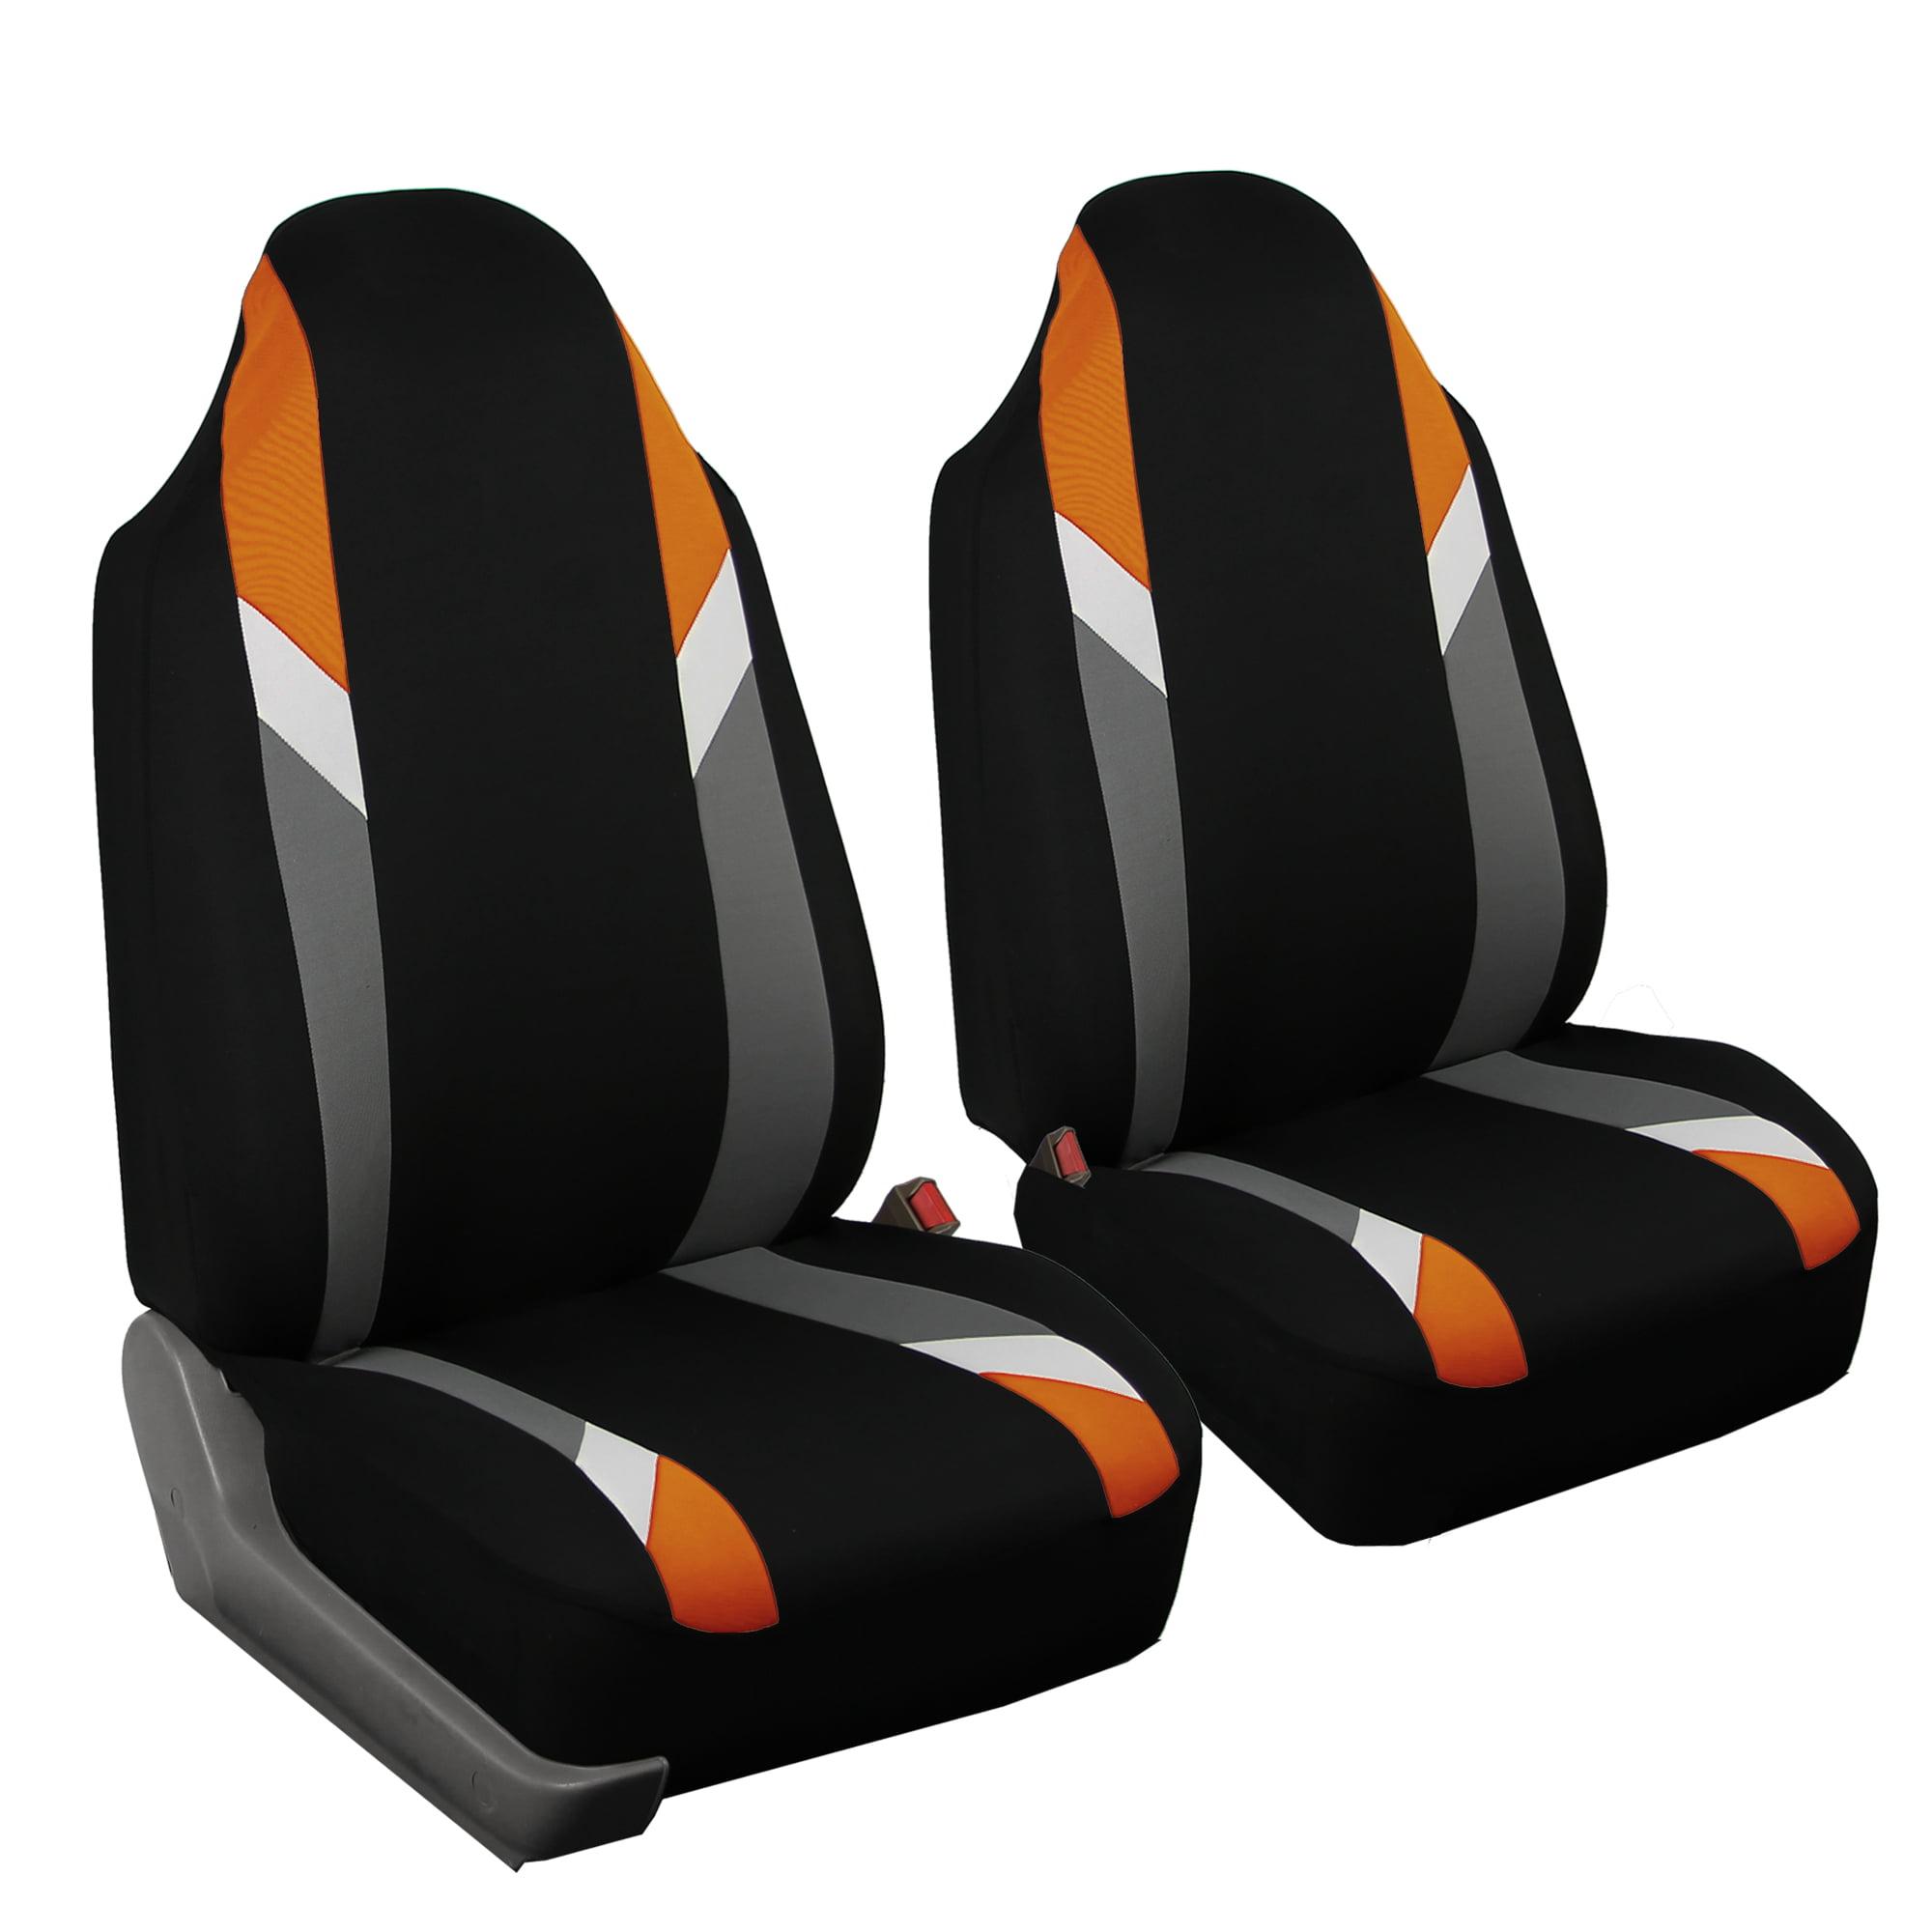 FH GROUP Premium Modernistic Front Set Car Seat Covers, Orange